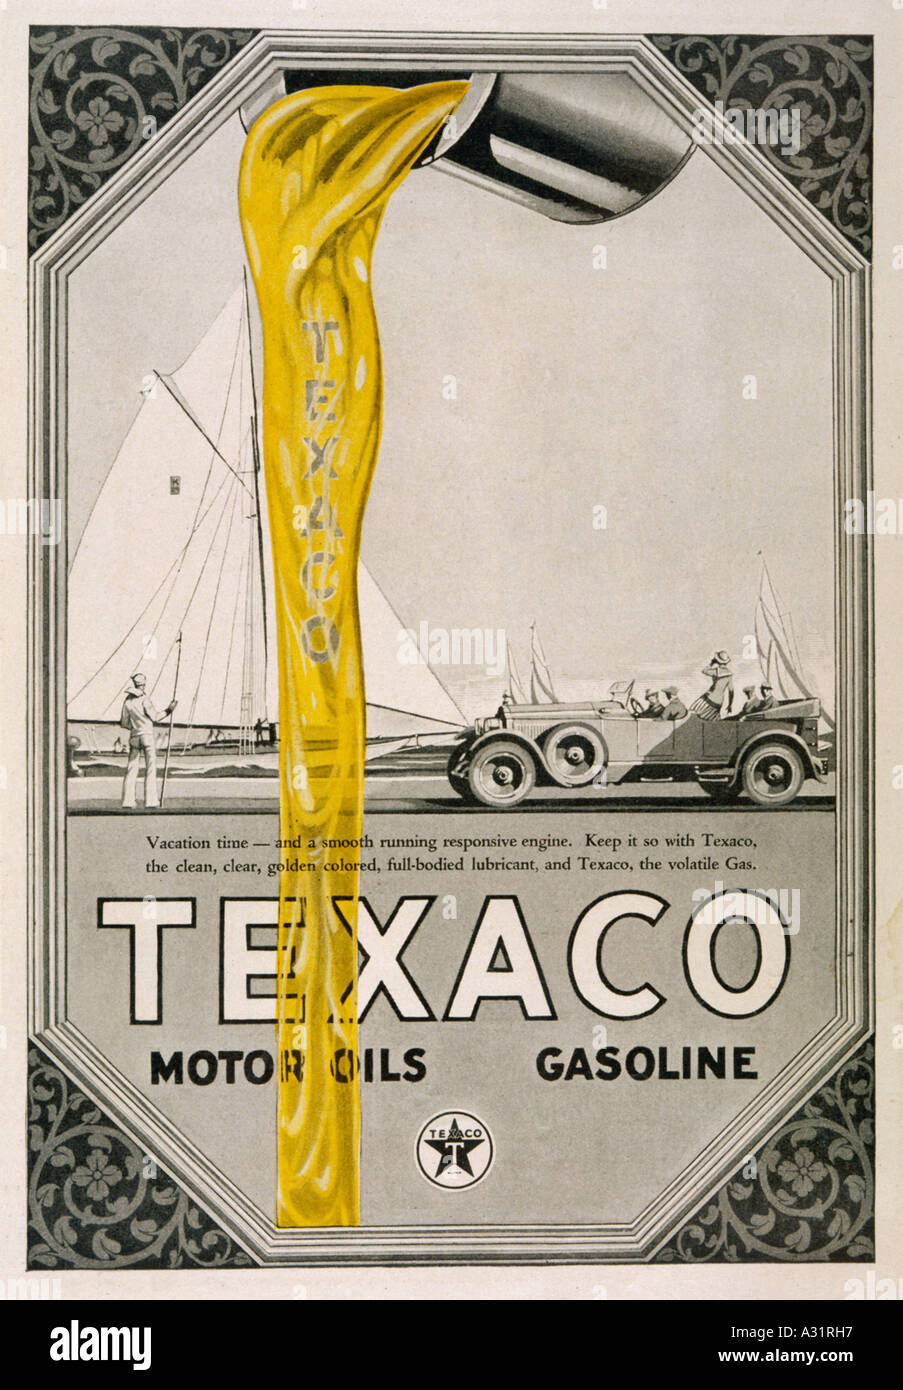 Advert Texaco Motor Oils Stock Photo